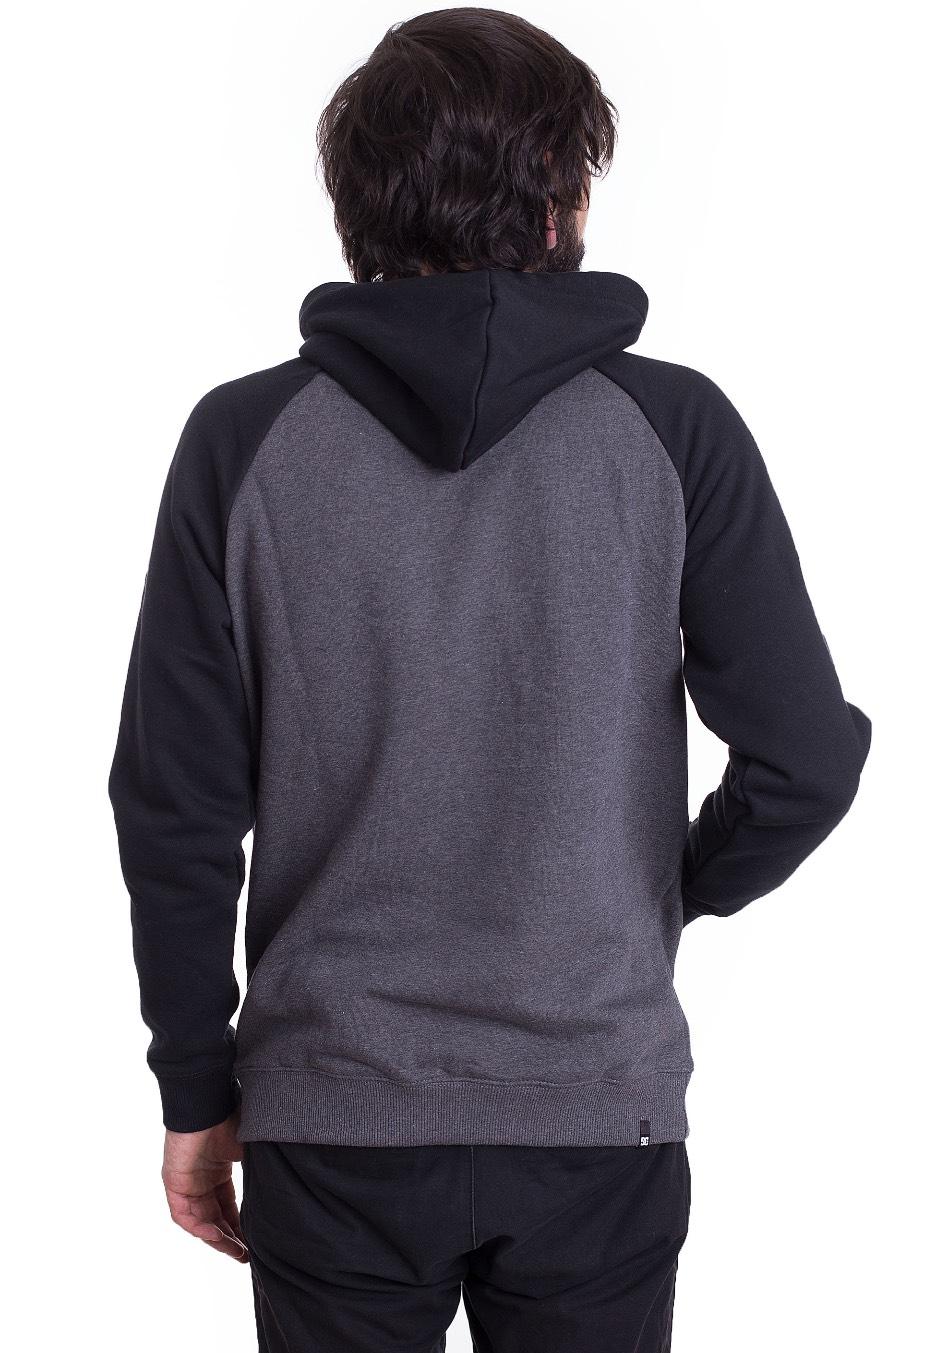 DC - Circle Star Raglan Black Charcoal Heather - Hoodie - Streetwear ... 6cda9a2078